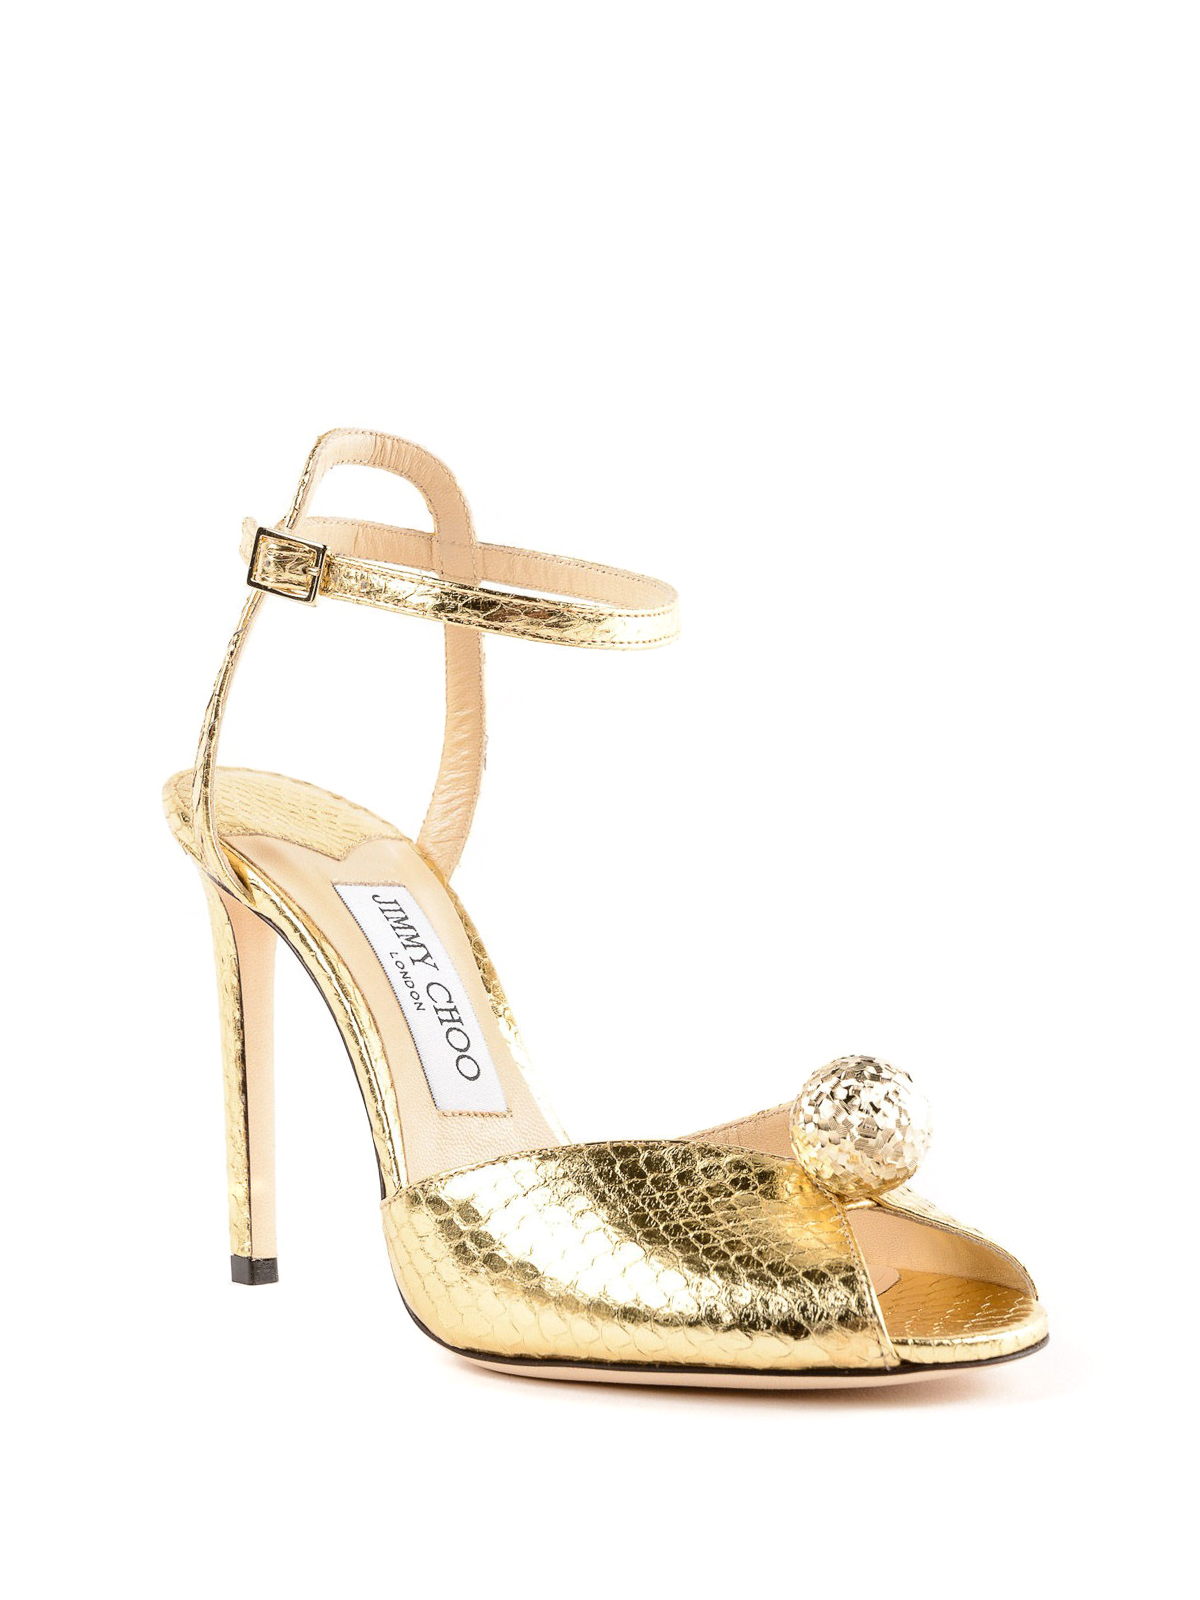 bfebba32d37 Jimmy Choo - Sacora gold elaphe peep toe sandals - sandals - SACORA ...